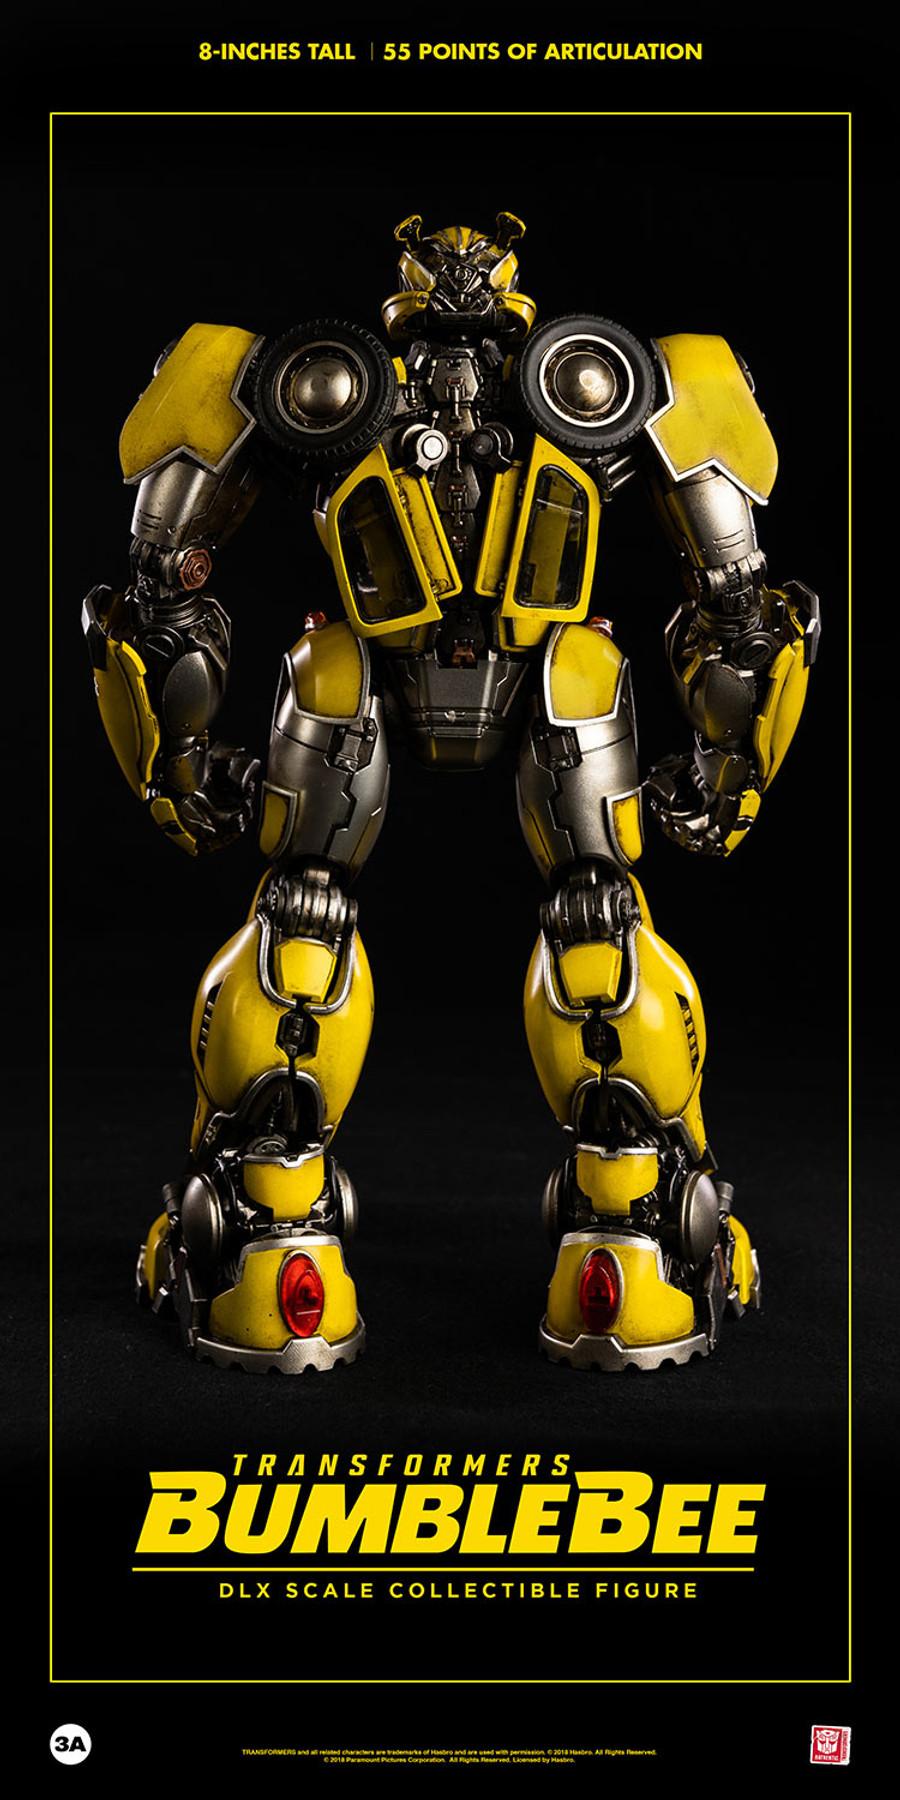 Threezero - Bumblebee Movie: DLX Bumblebee (3rd Batch)